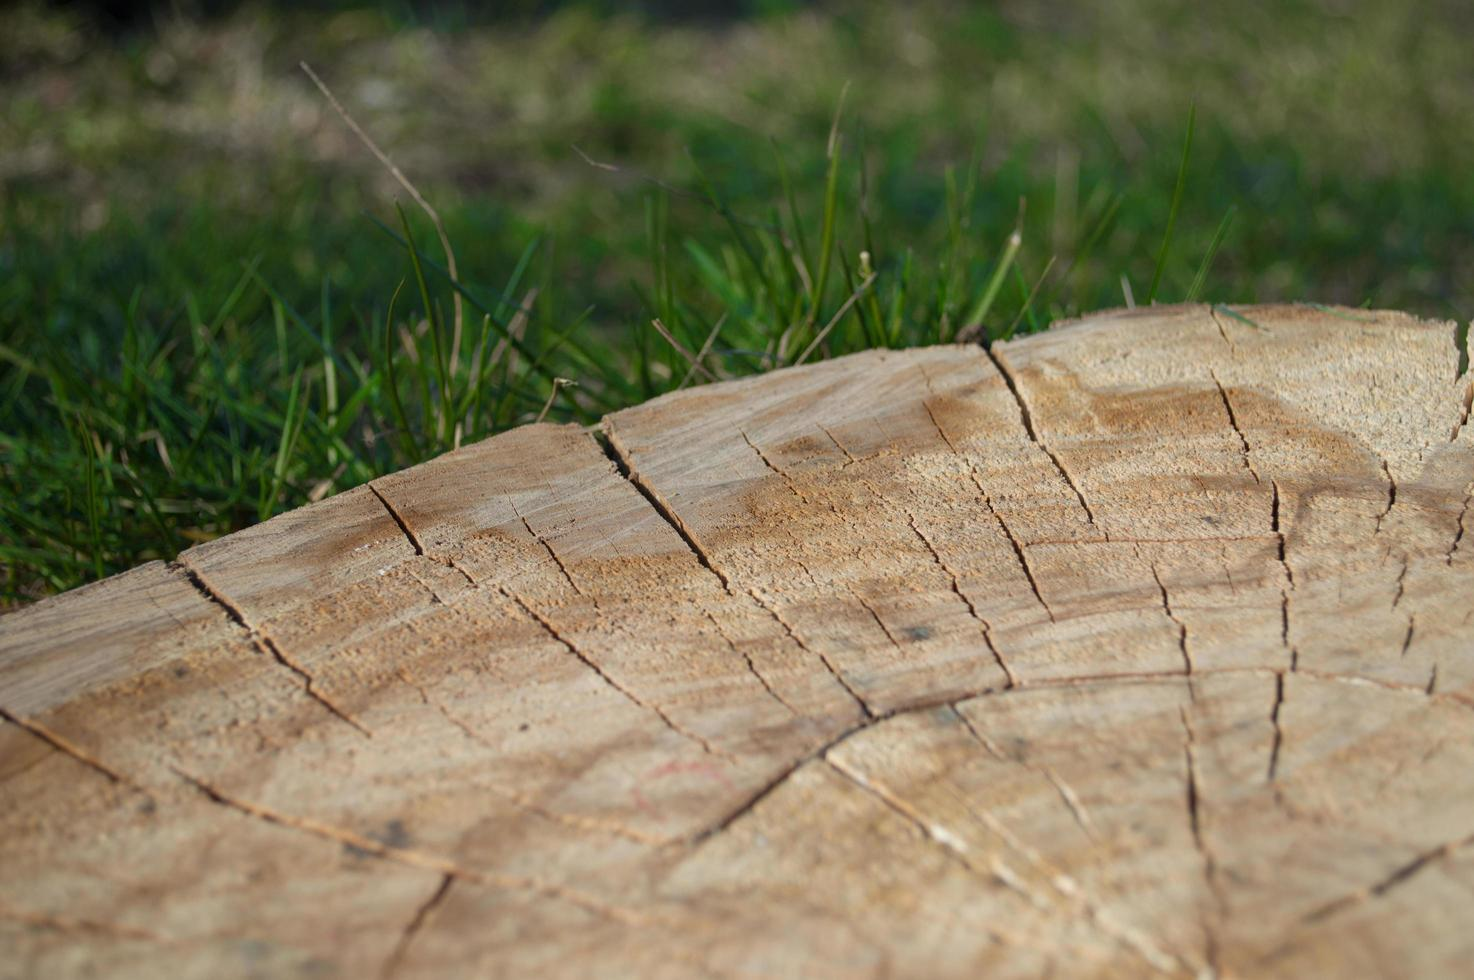 Stump closeup with green grass photo